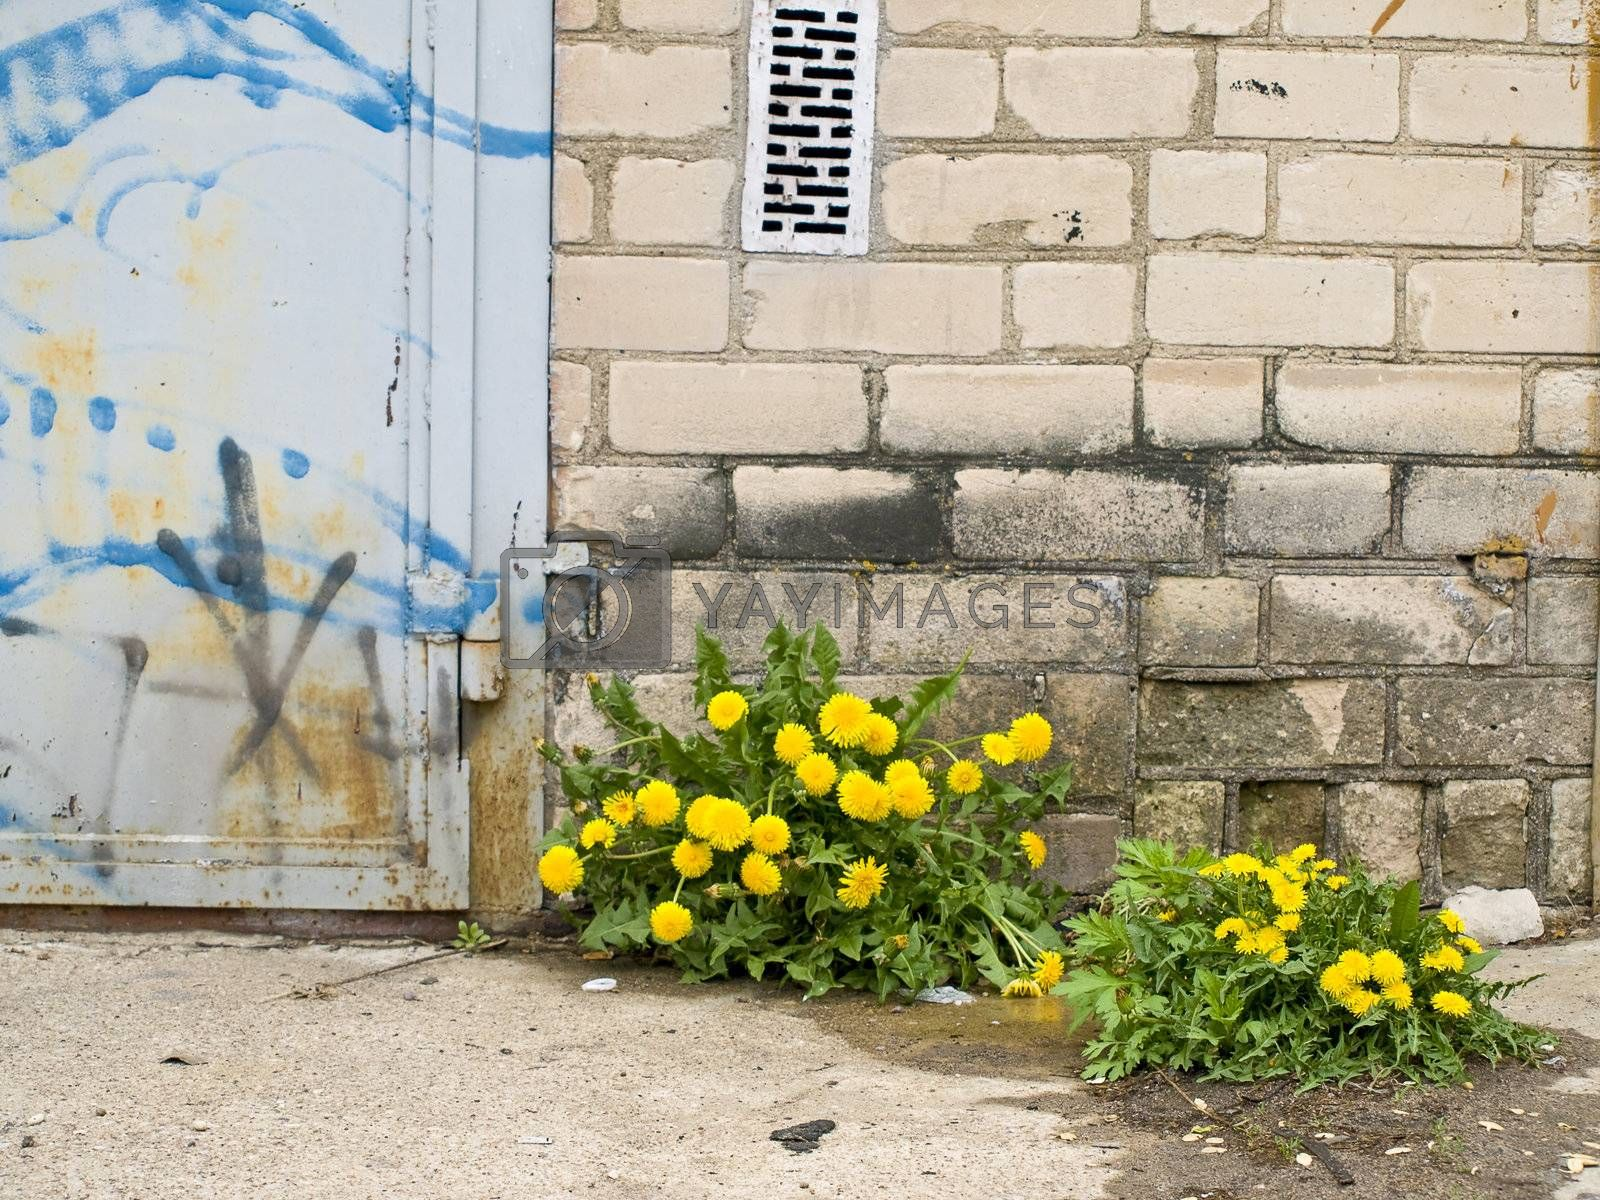 Yellow dandelions near the brick wall and door